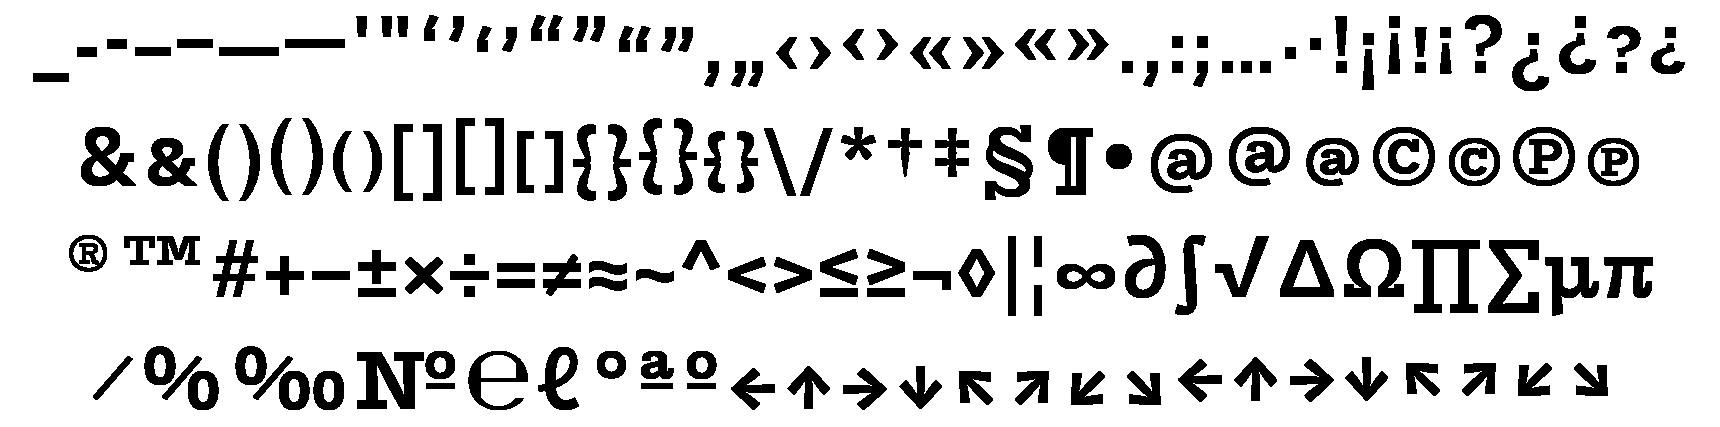 <p>Punctuation &amp; symbols</p> glyphs